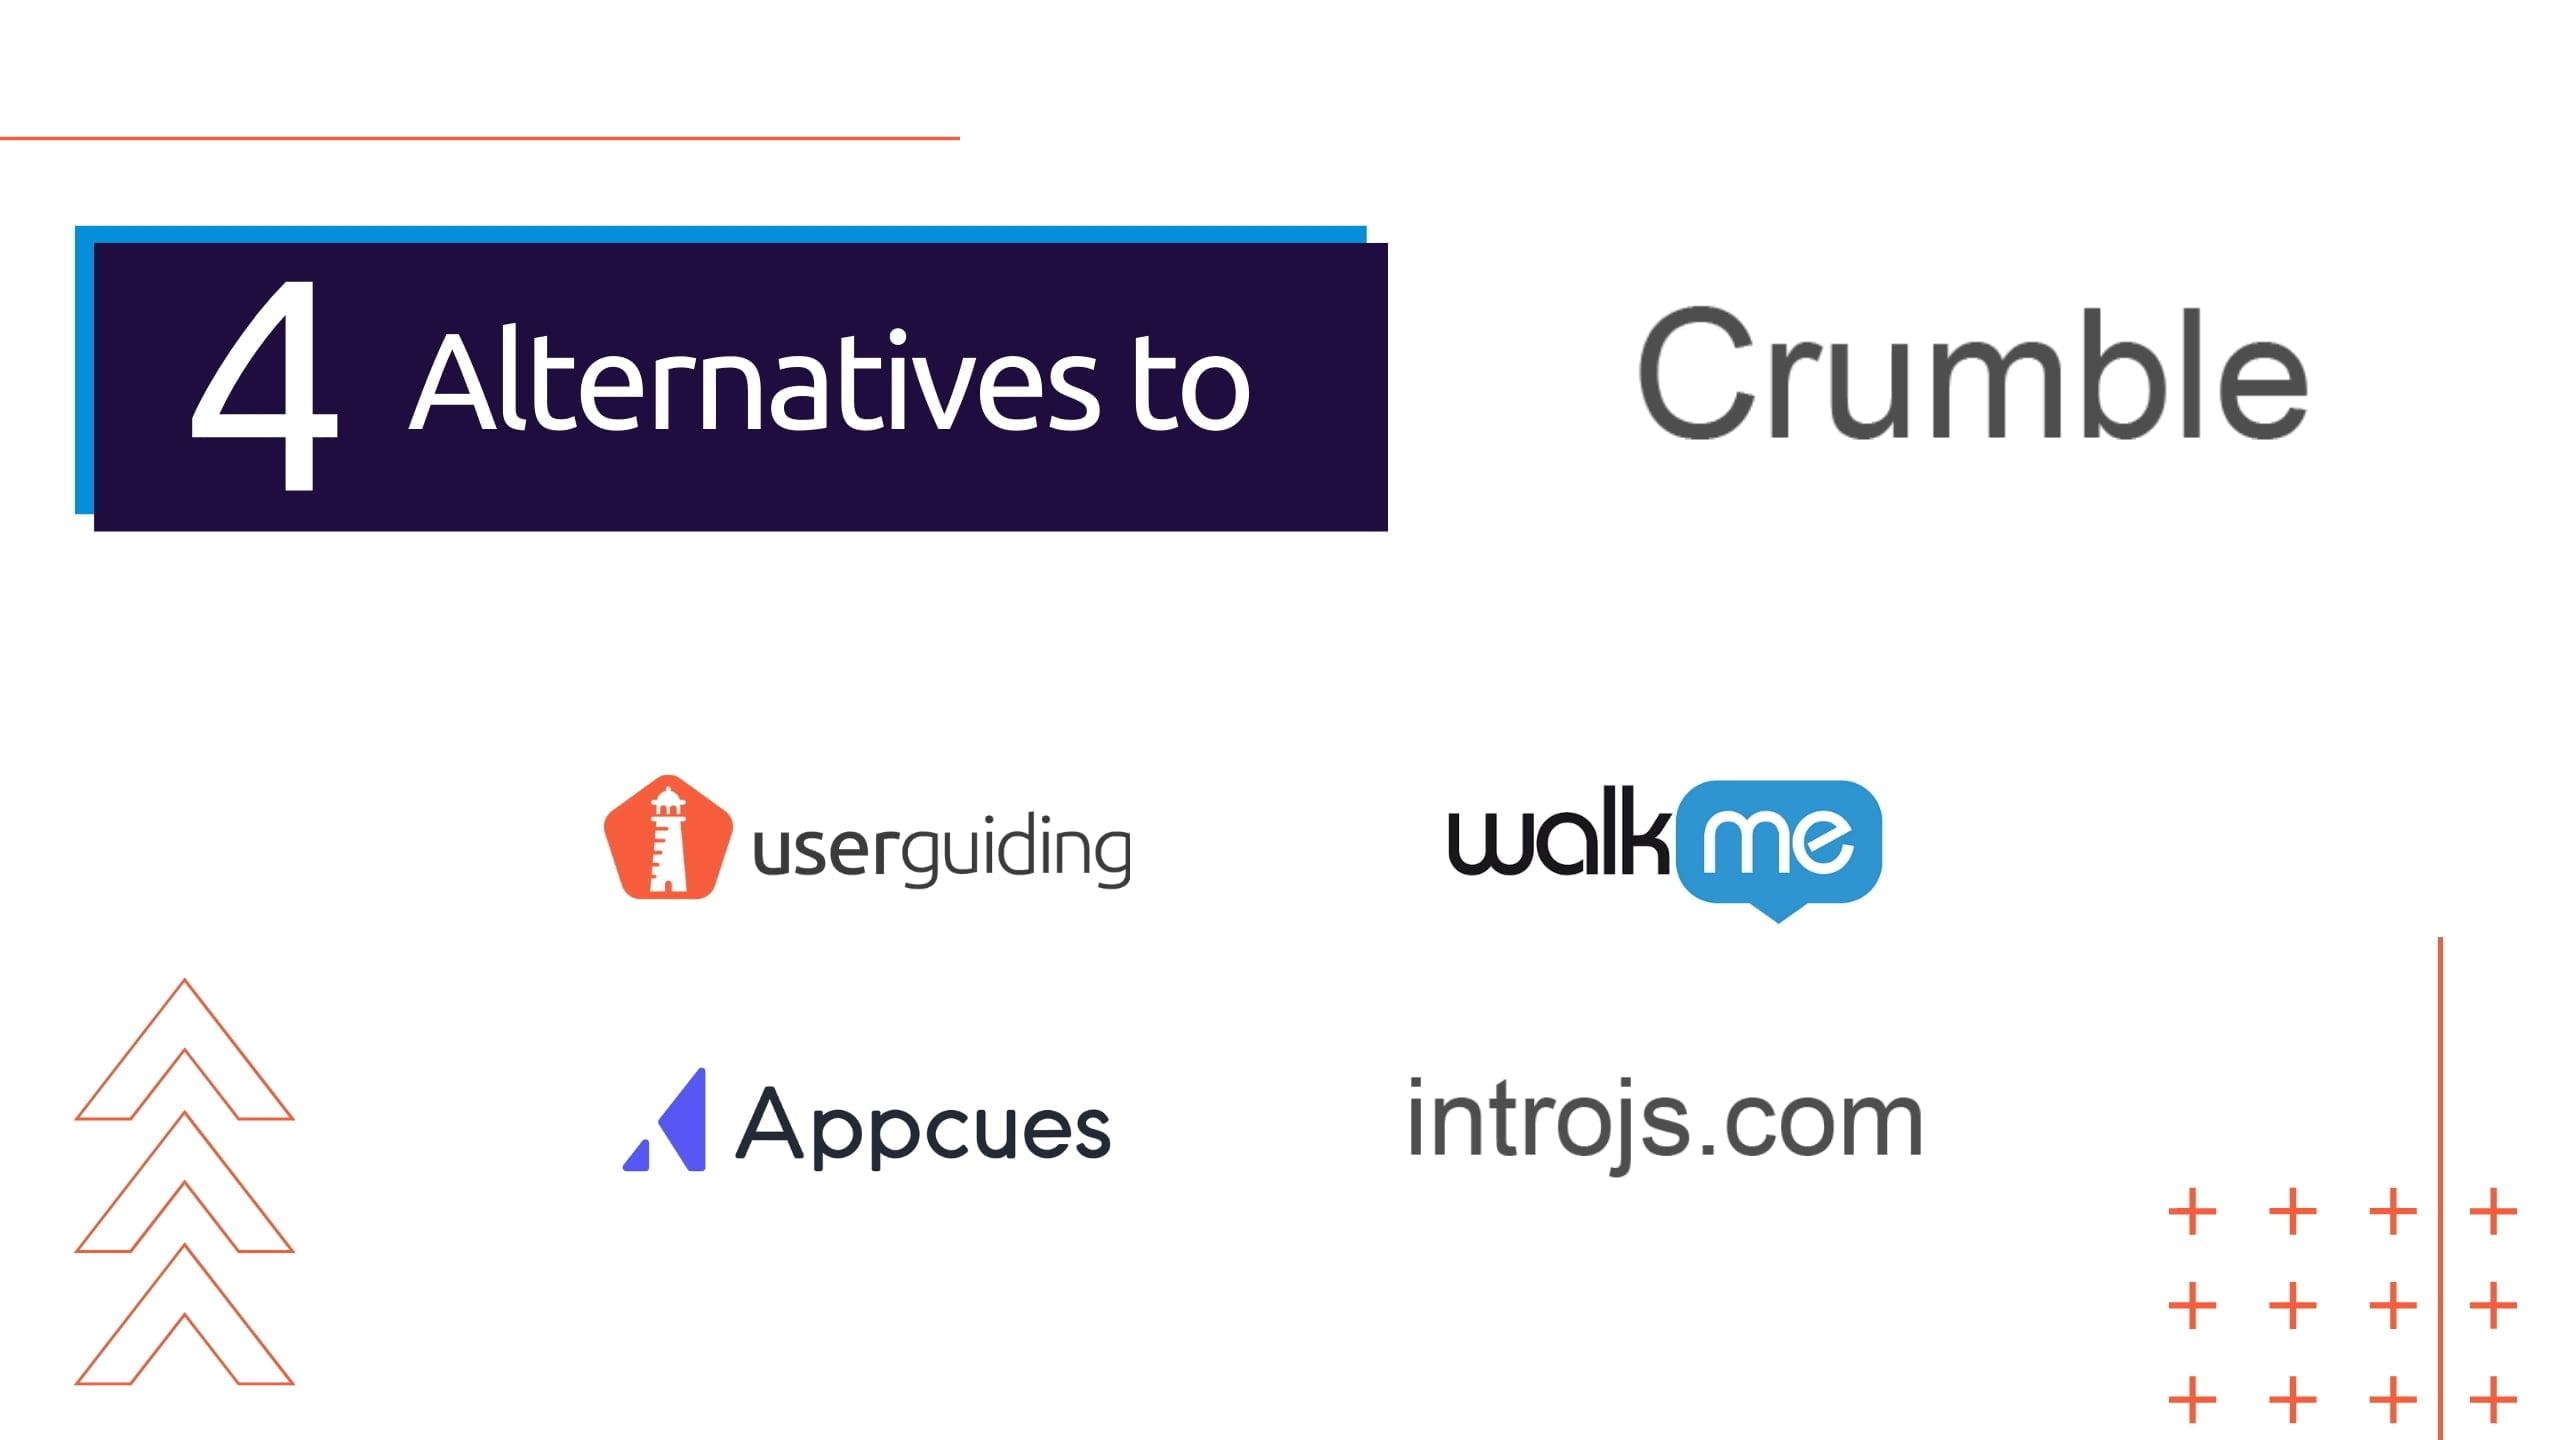 crumble alternatives